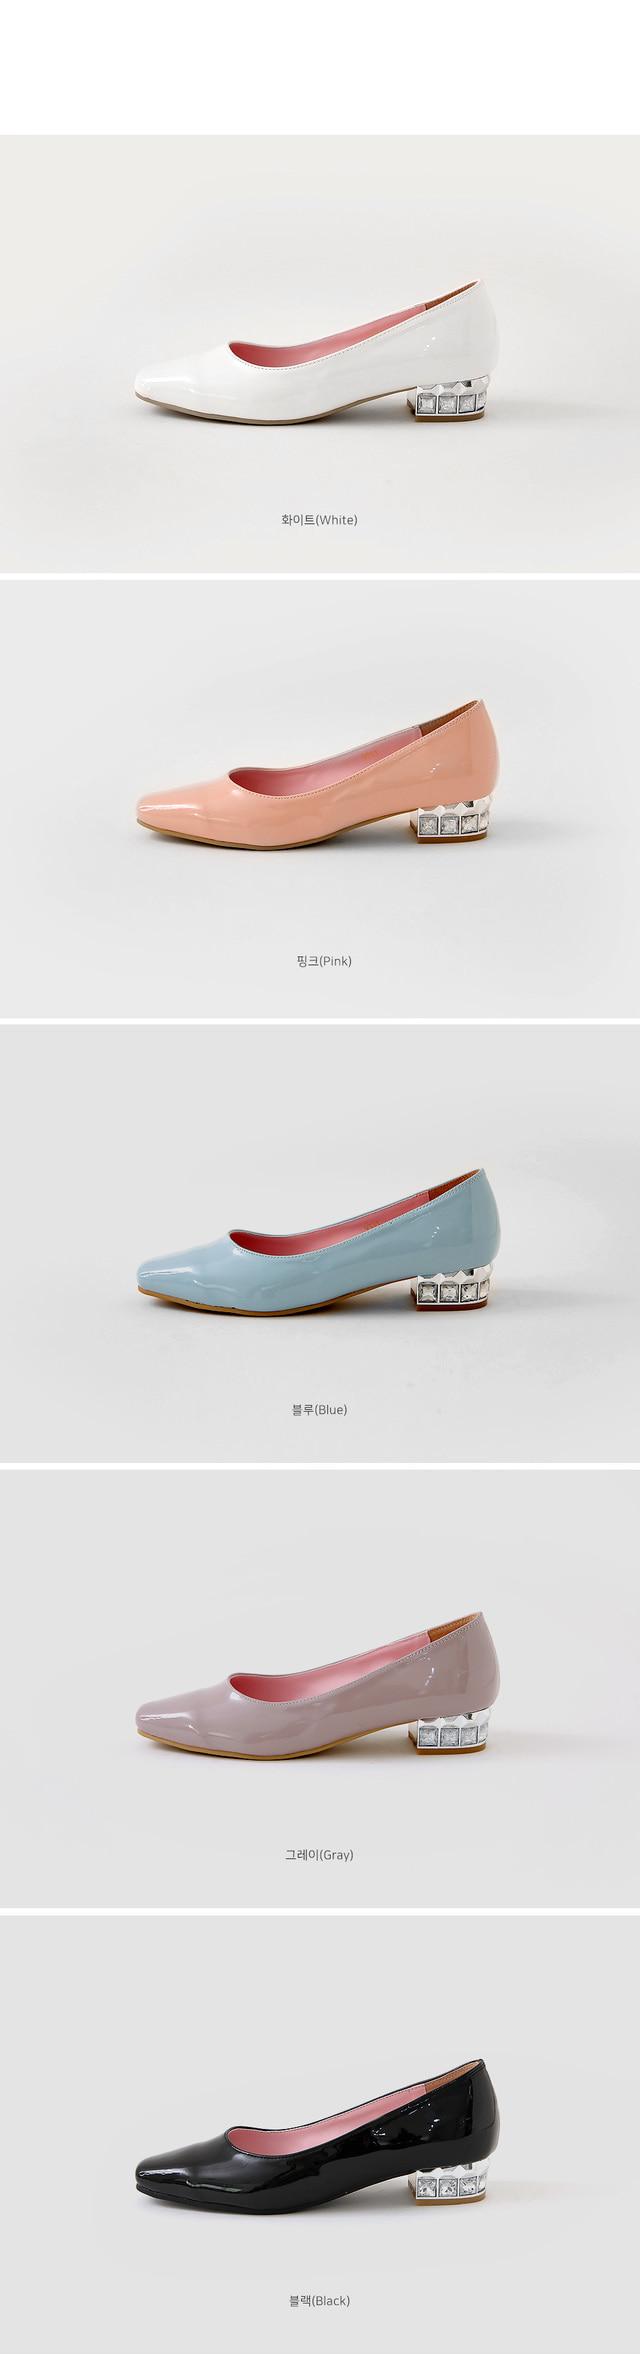 Pretty flat shoes 3cm